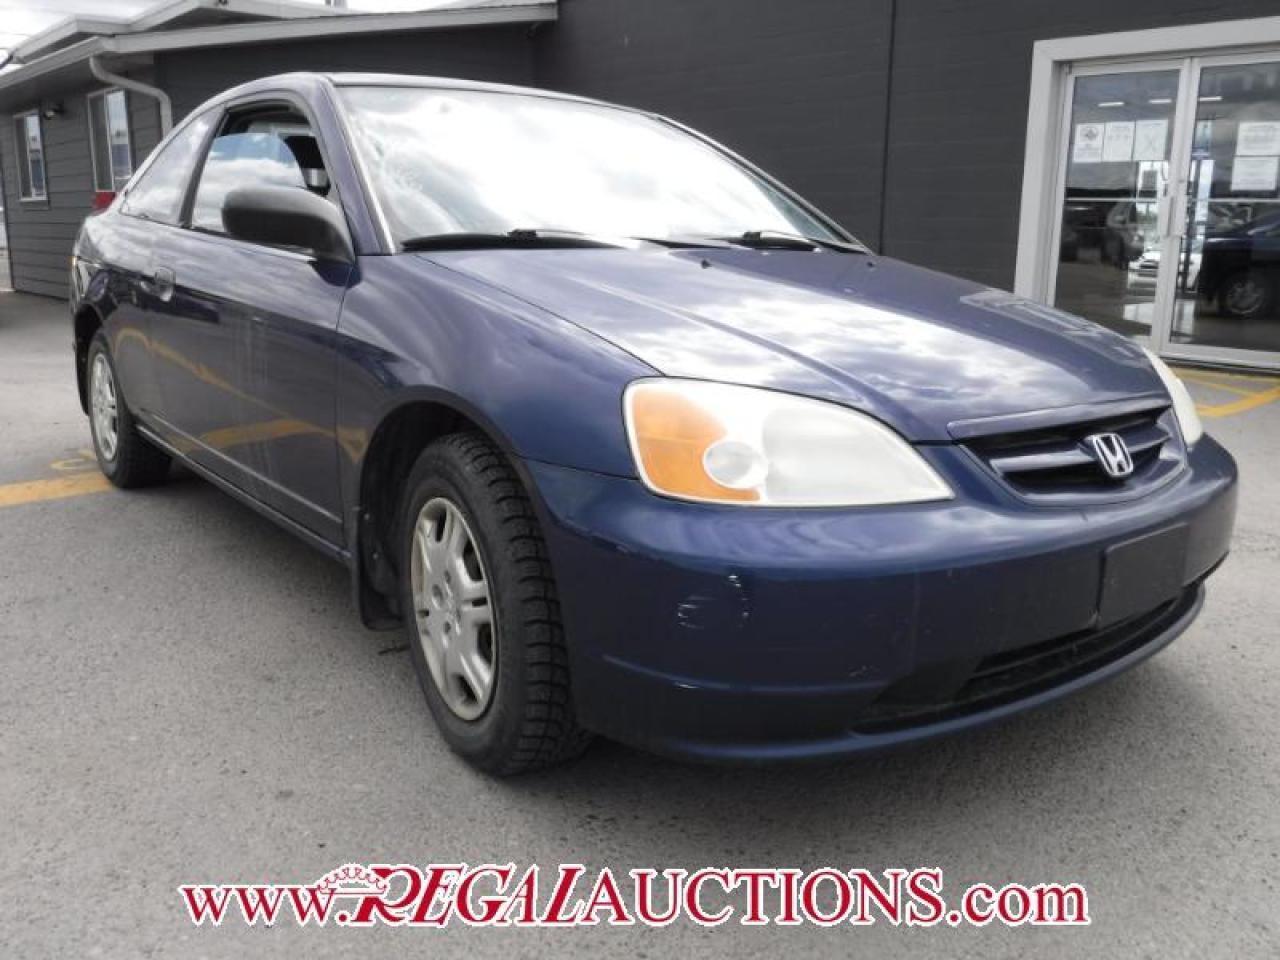 Photo of Blue 2001 Honda Civic